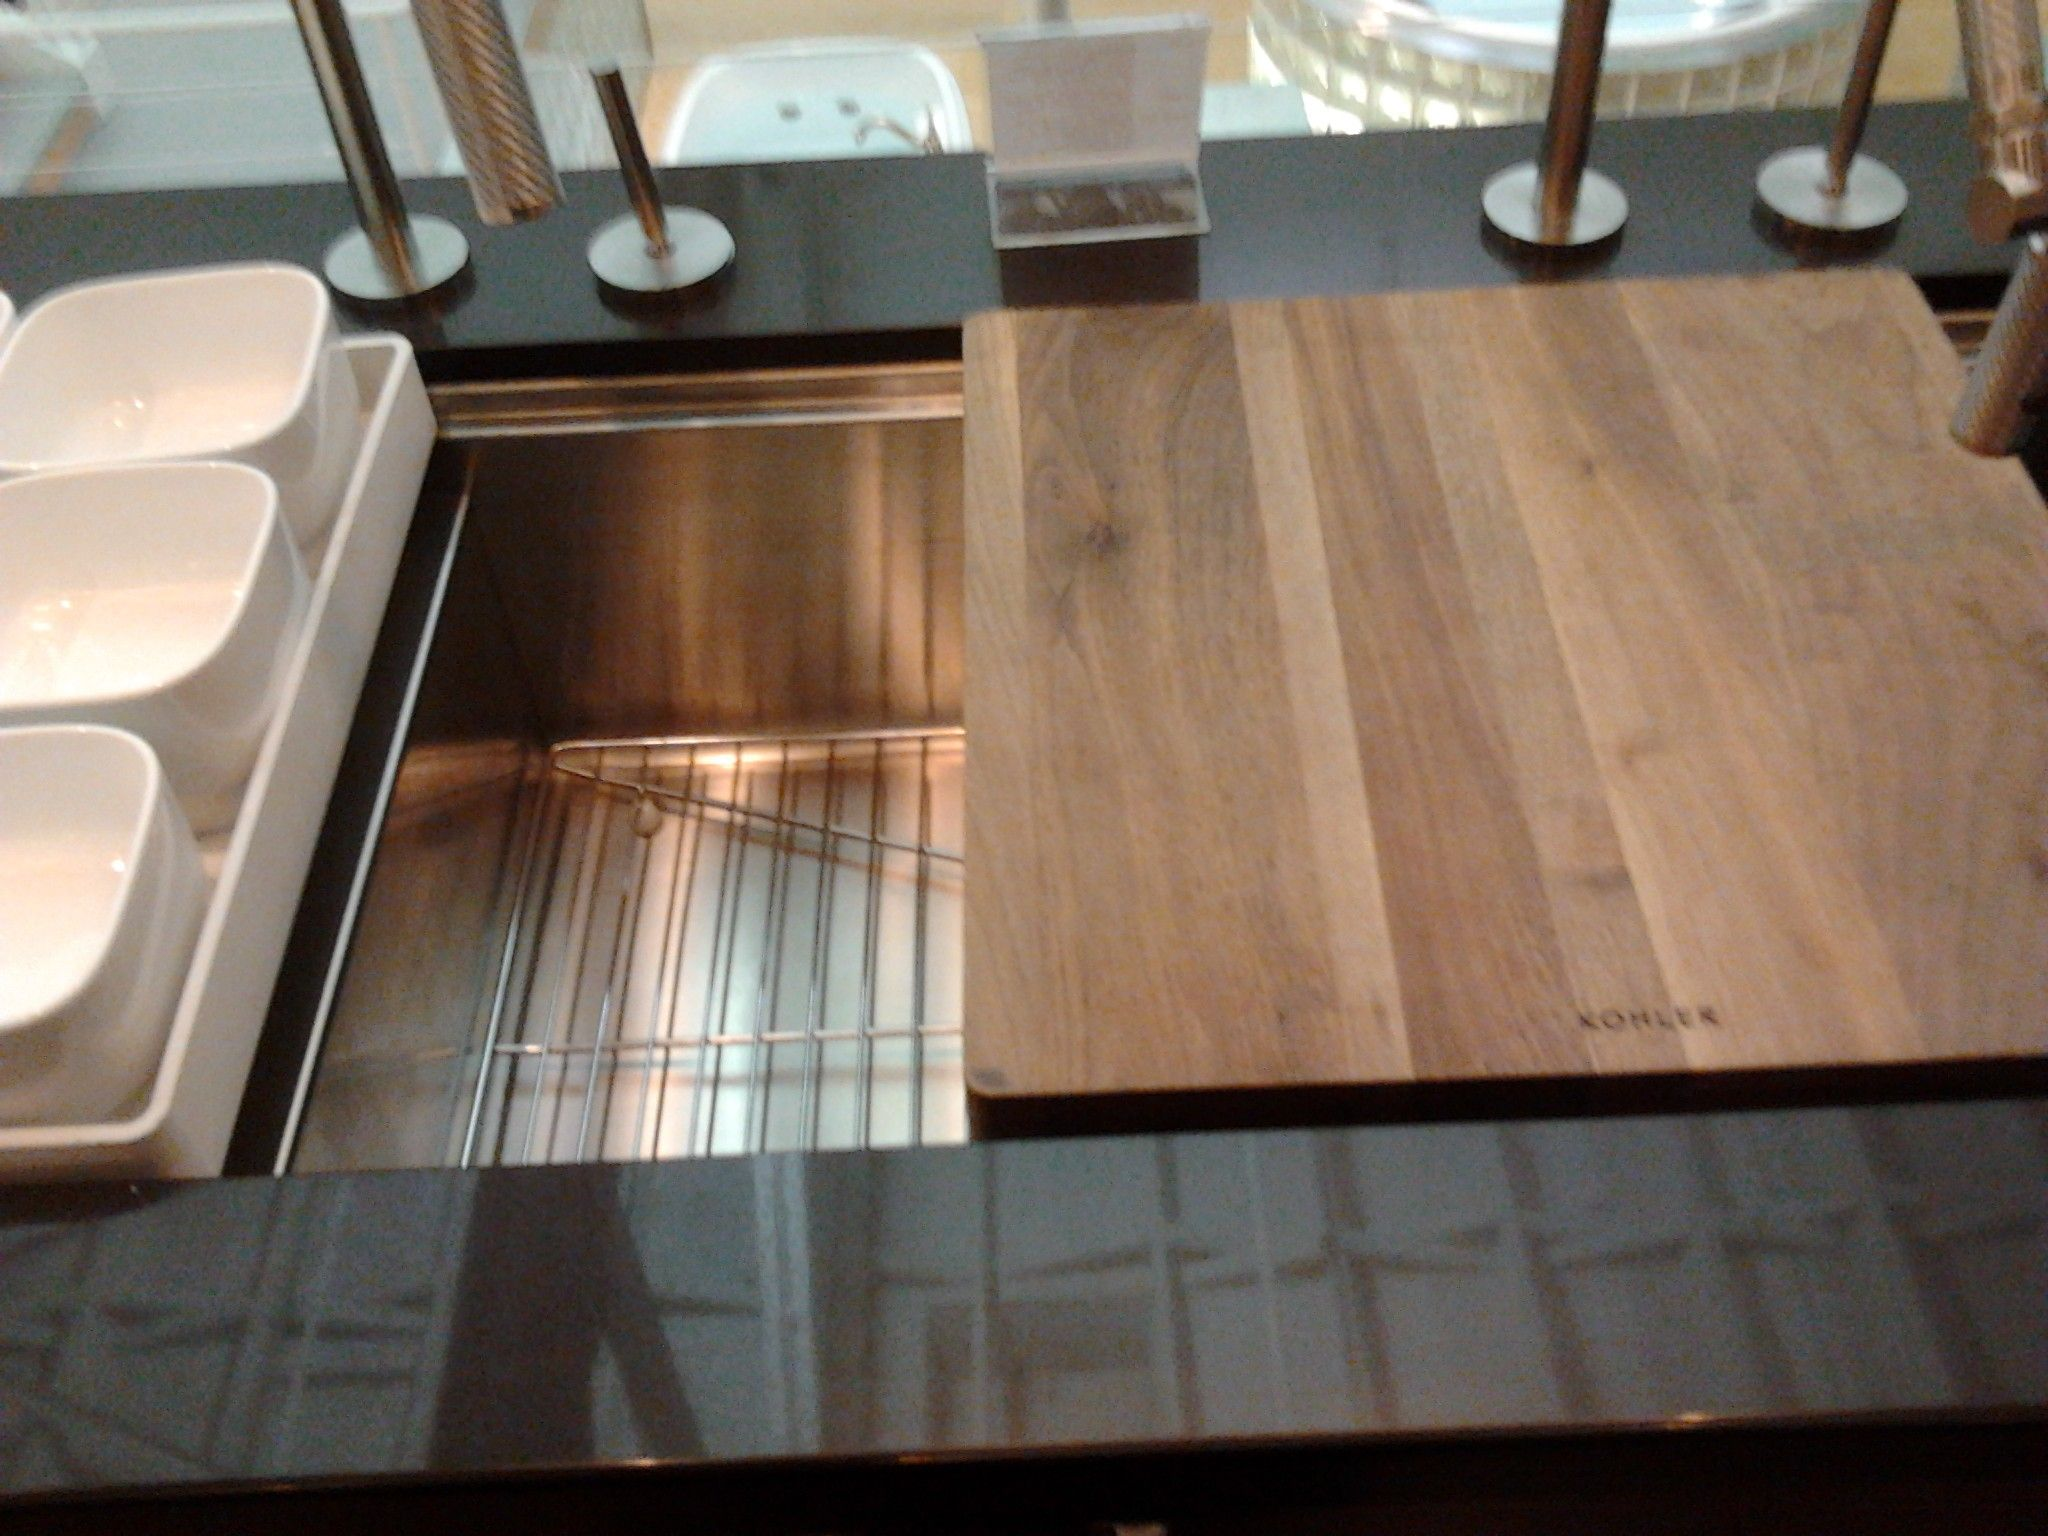 kohler kohler kitchen sink Innovations in the kitchen